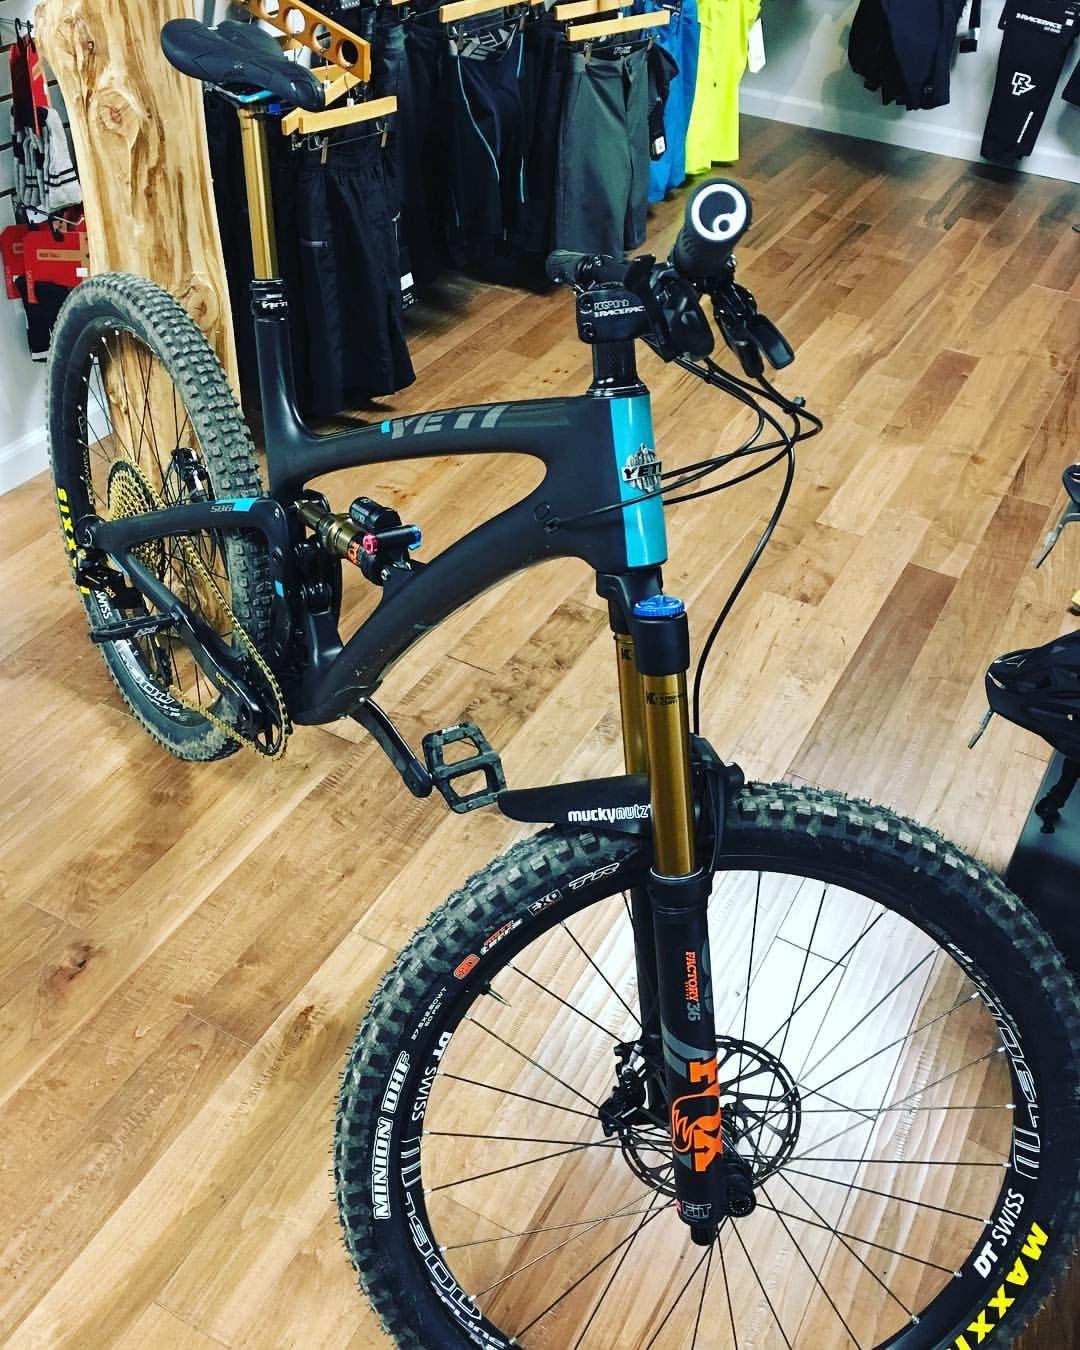 26 Likes 1 Comments Jb S Bike Shop Jbmtbs On Instagram